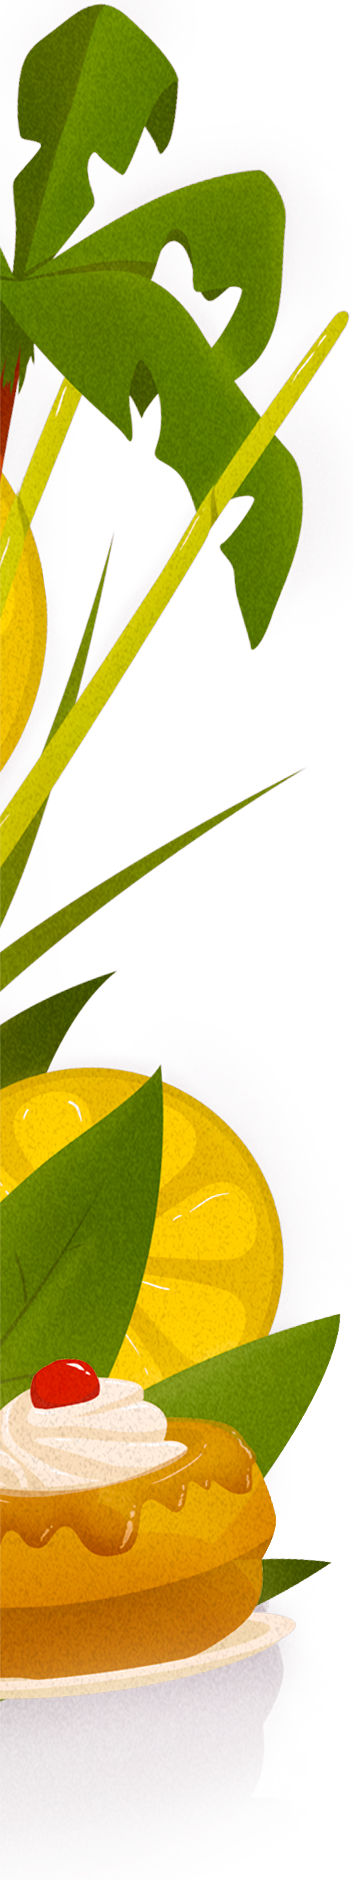 Illustration palmier